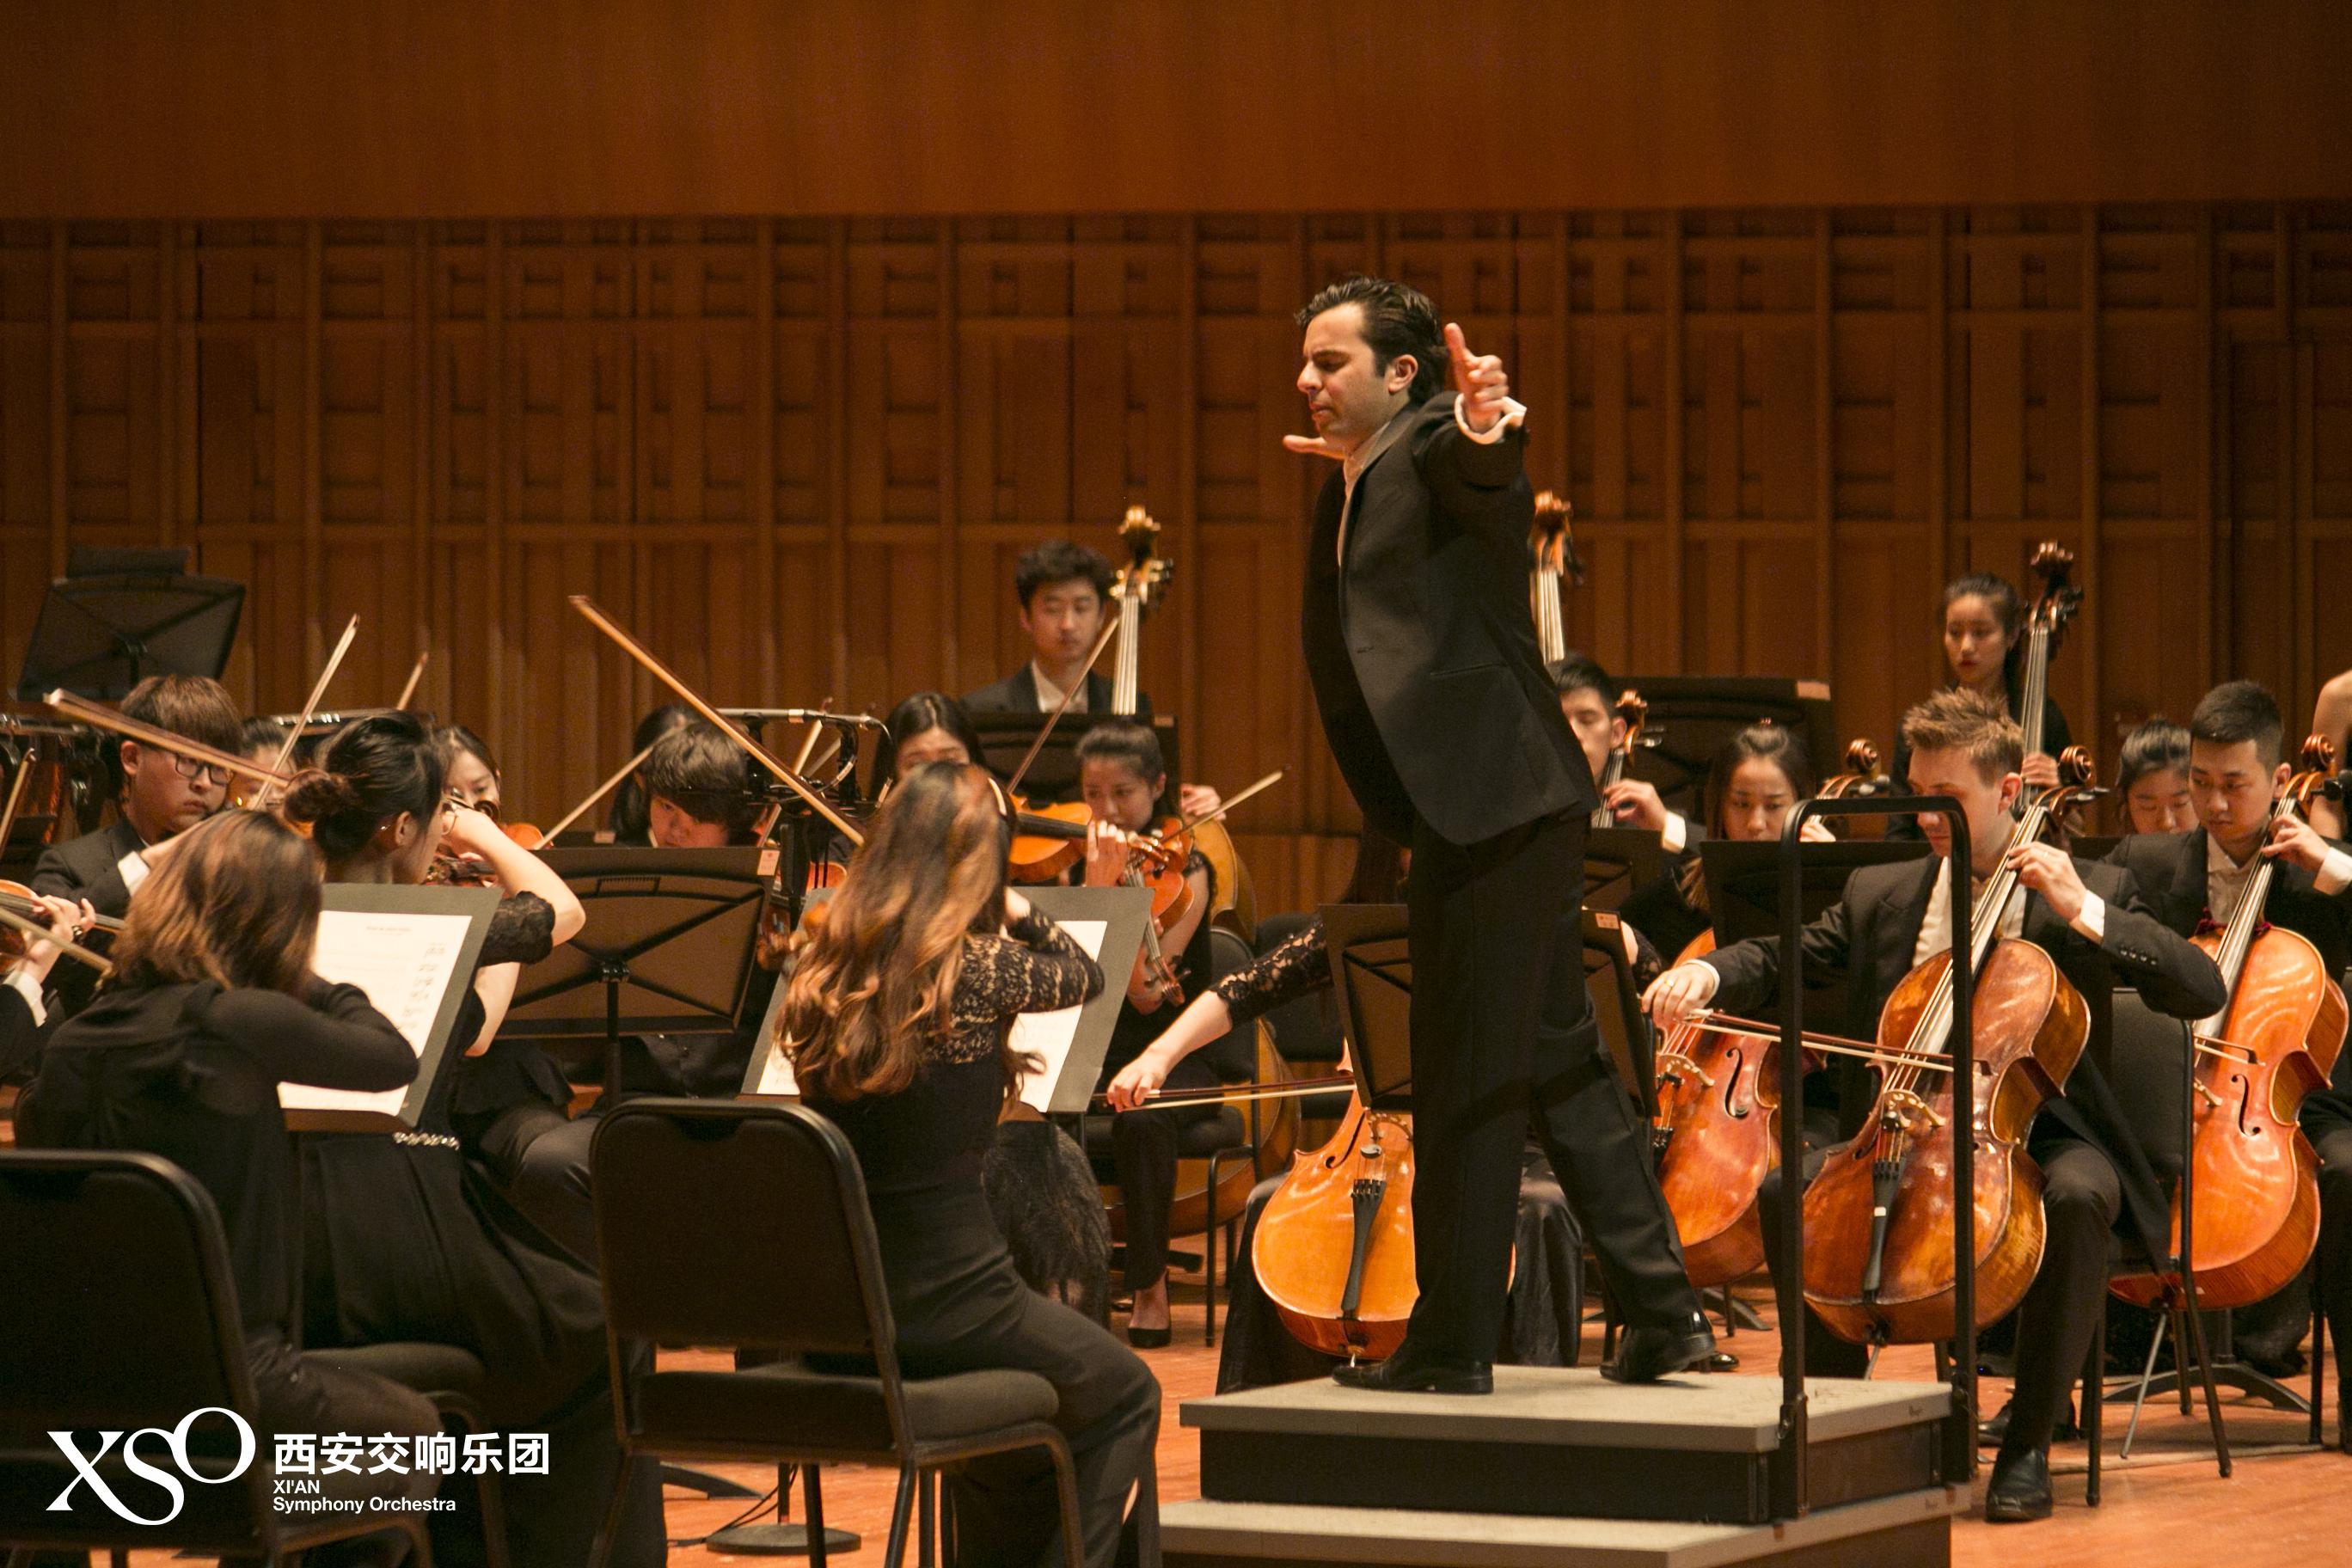 Xi'an Symphony Orchestra